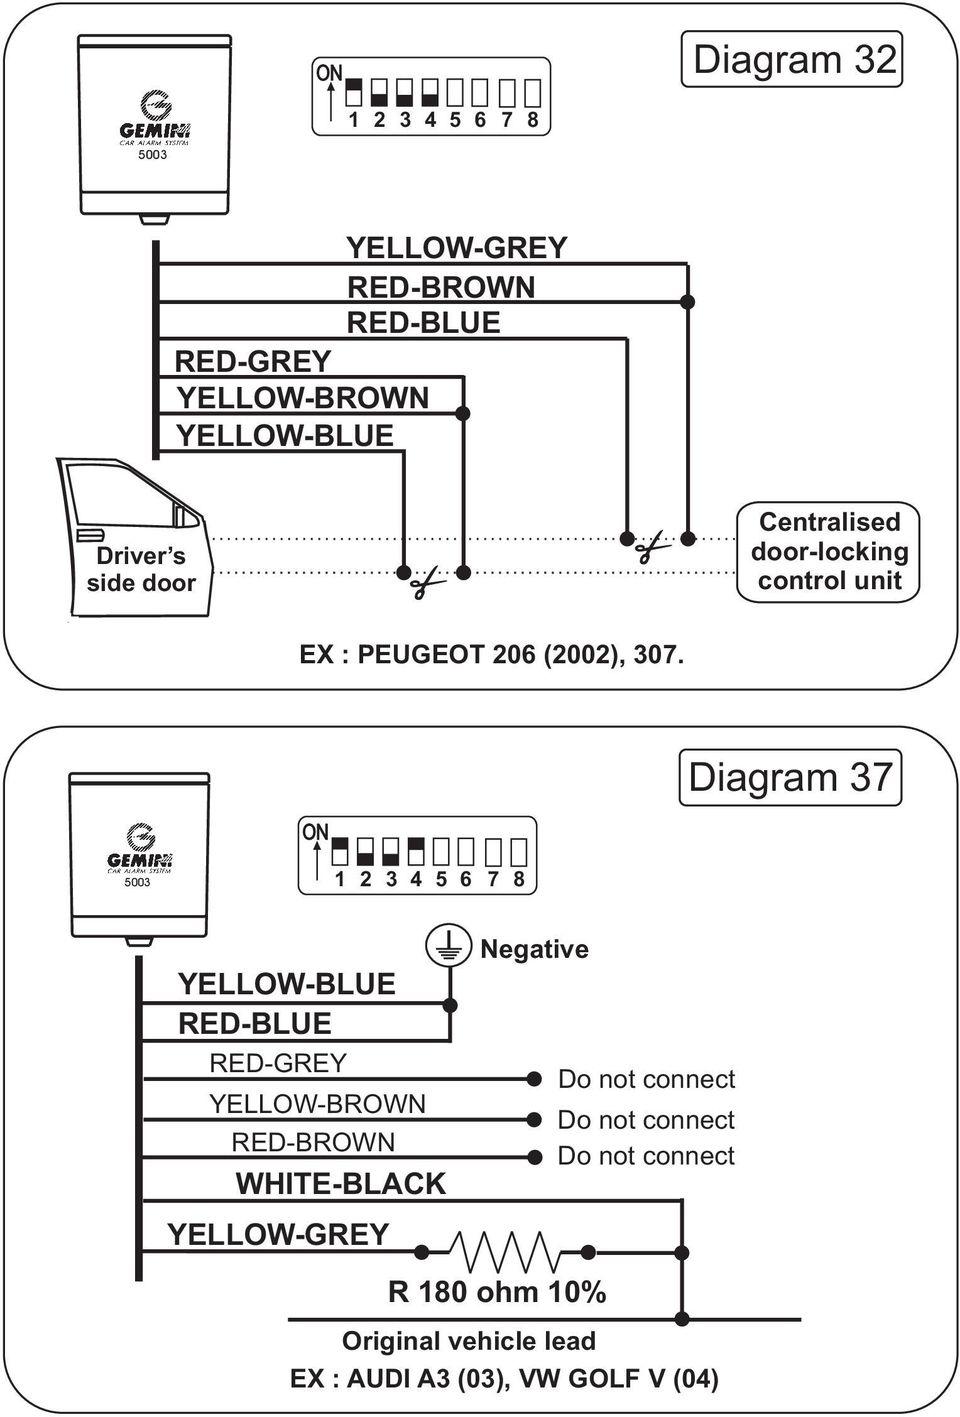 hight resolution of  2002 307 5002 3 installation instructions pdf 2002 307 skoda fabia central locking wiring diagram